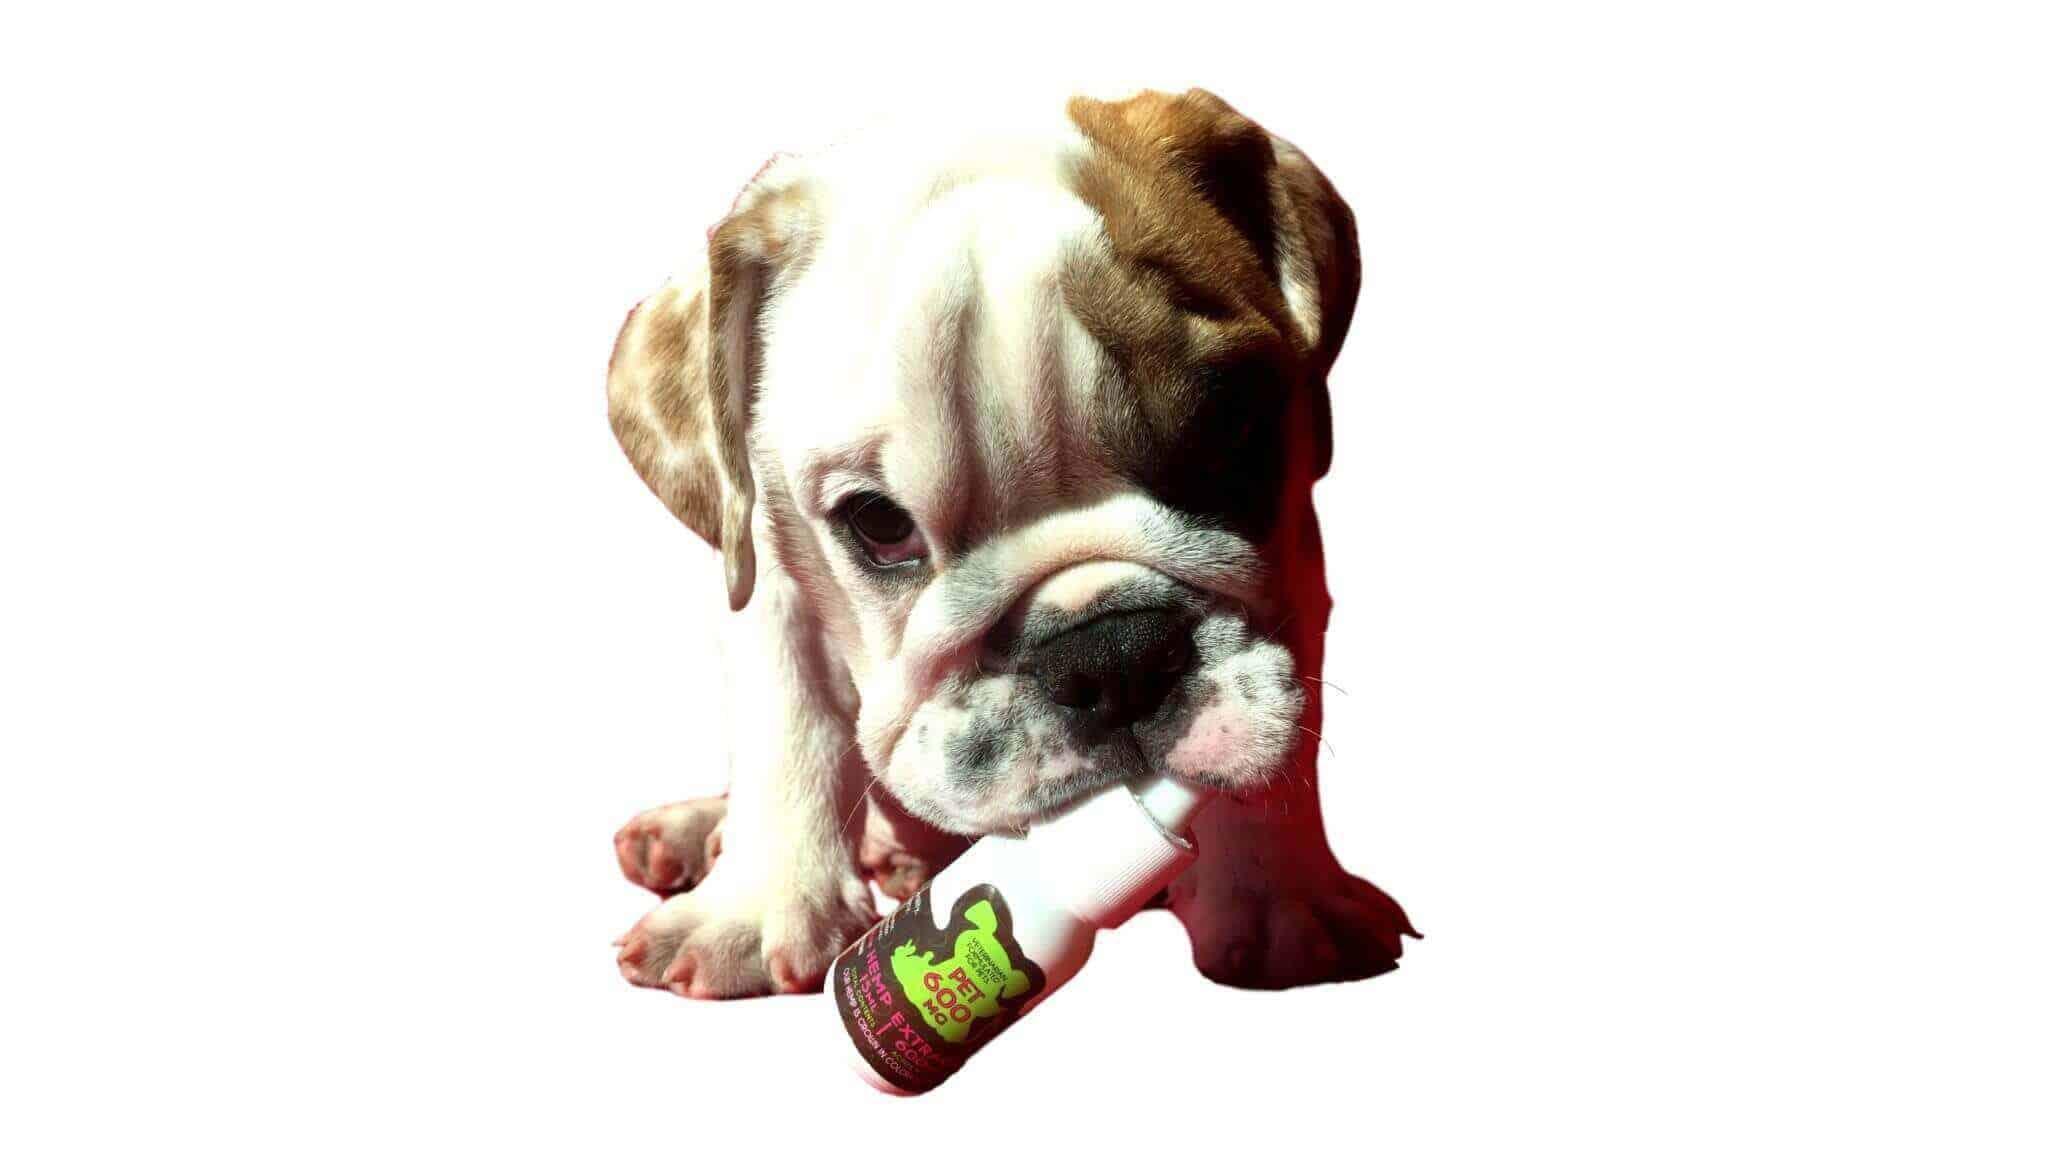 Dog With Pet CBD Oil